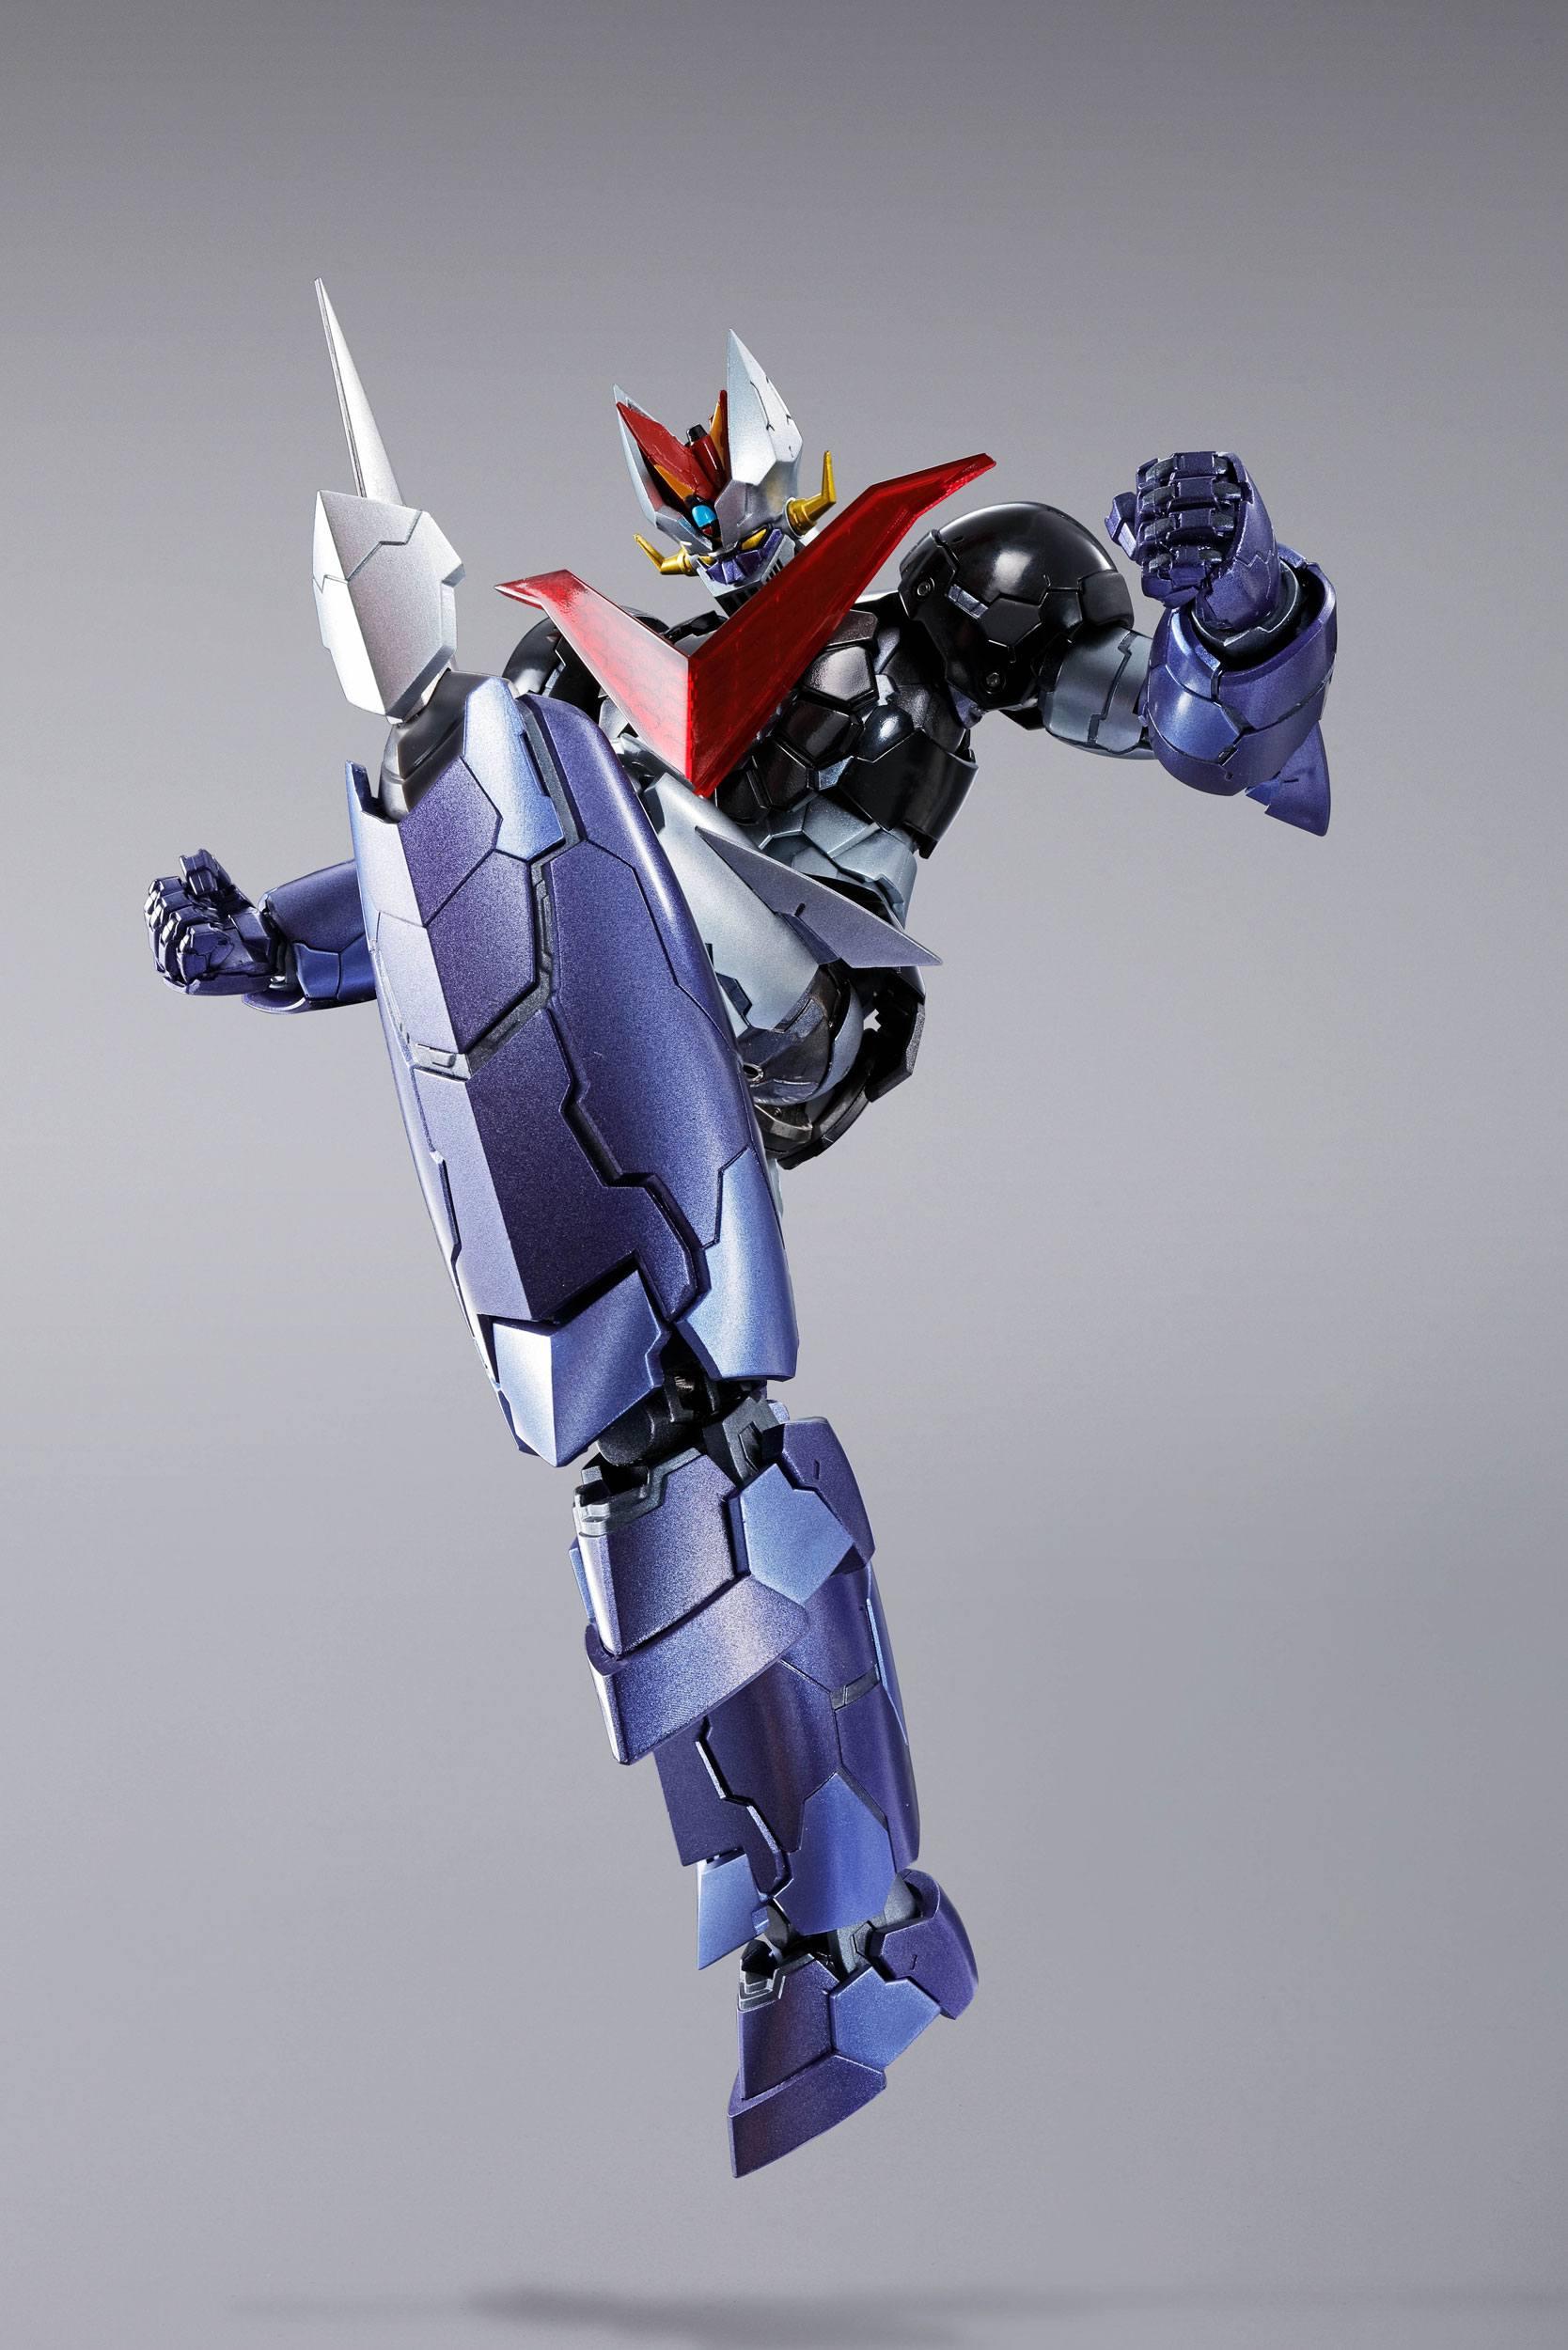 Mazinger Z Infinity Metal Build Action Figure Great Mazinger 20 cm - Animegami Store